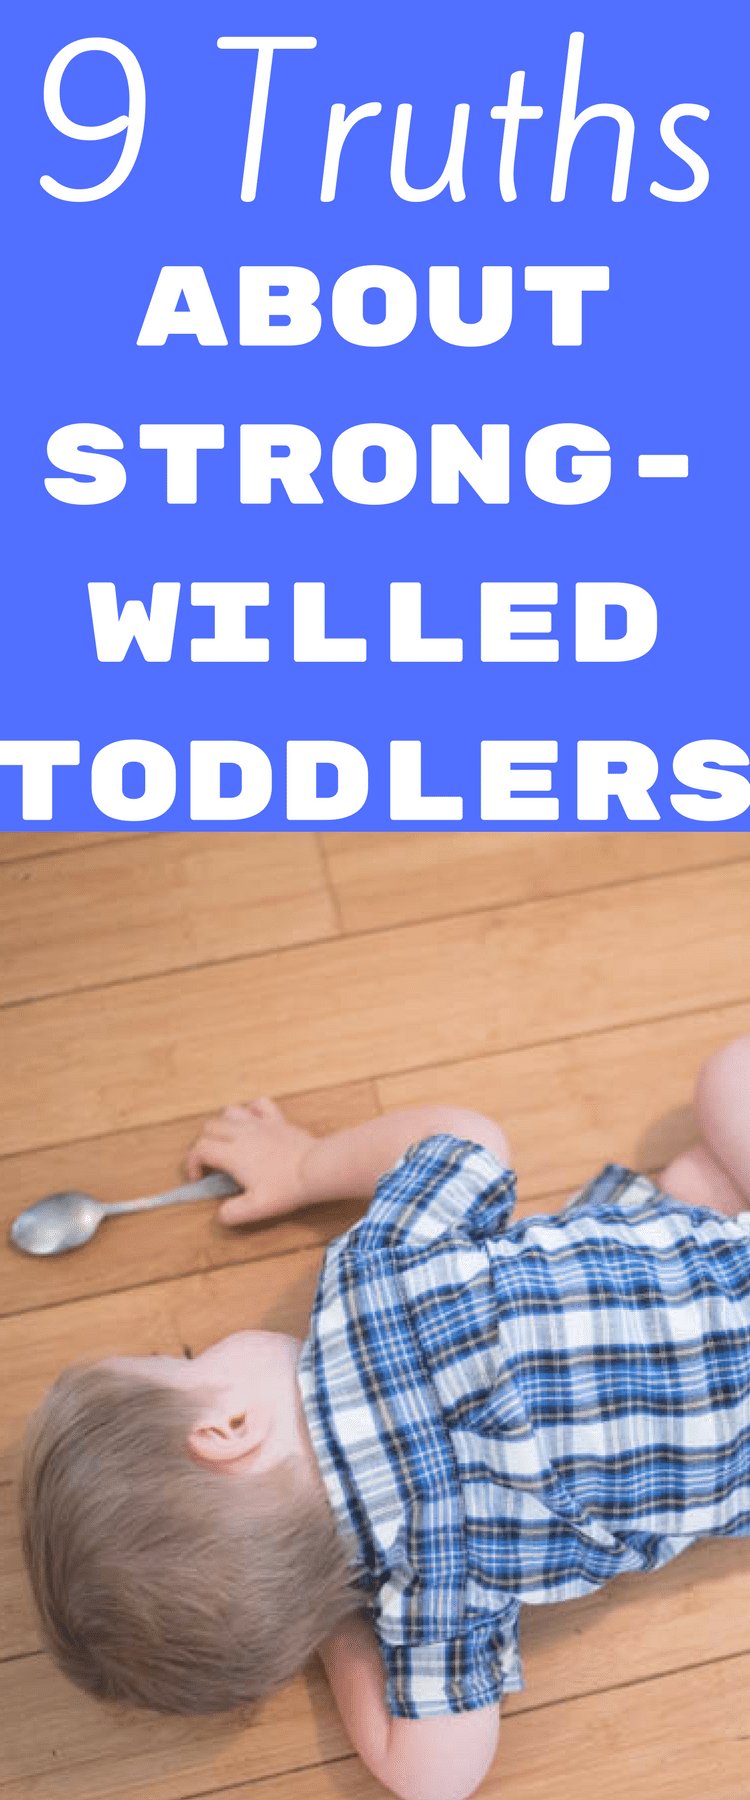 toddler / parenting a toddler / toddler tips / behavior / parenting / parenting tips / strong-willed  via @clarkscondensed